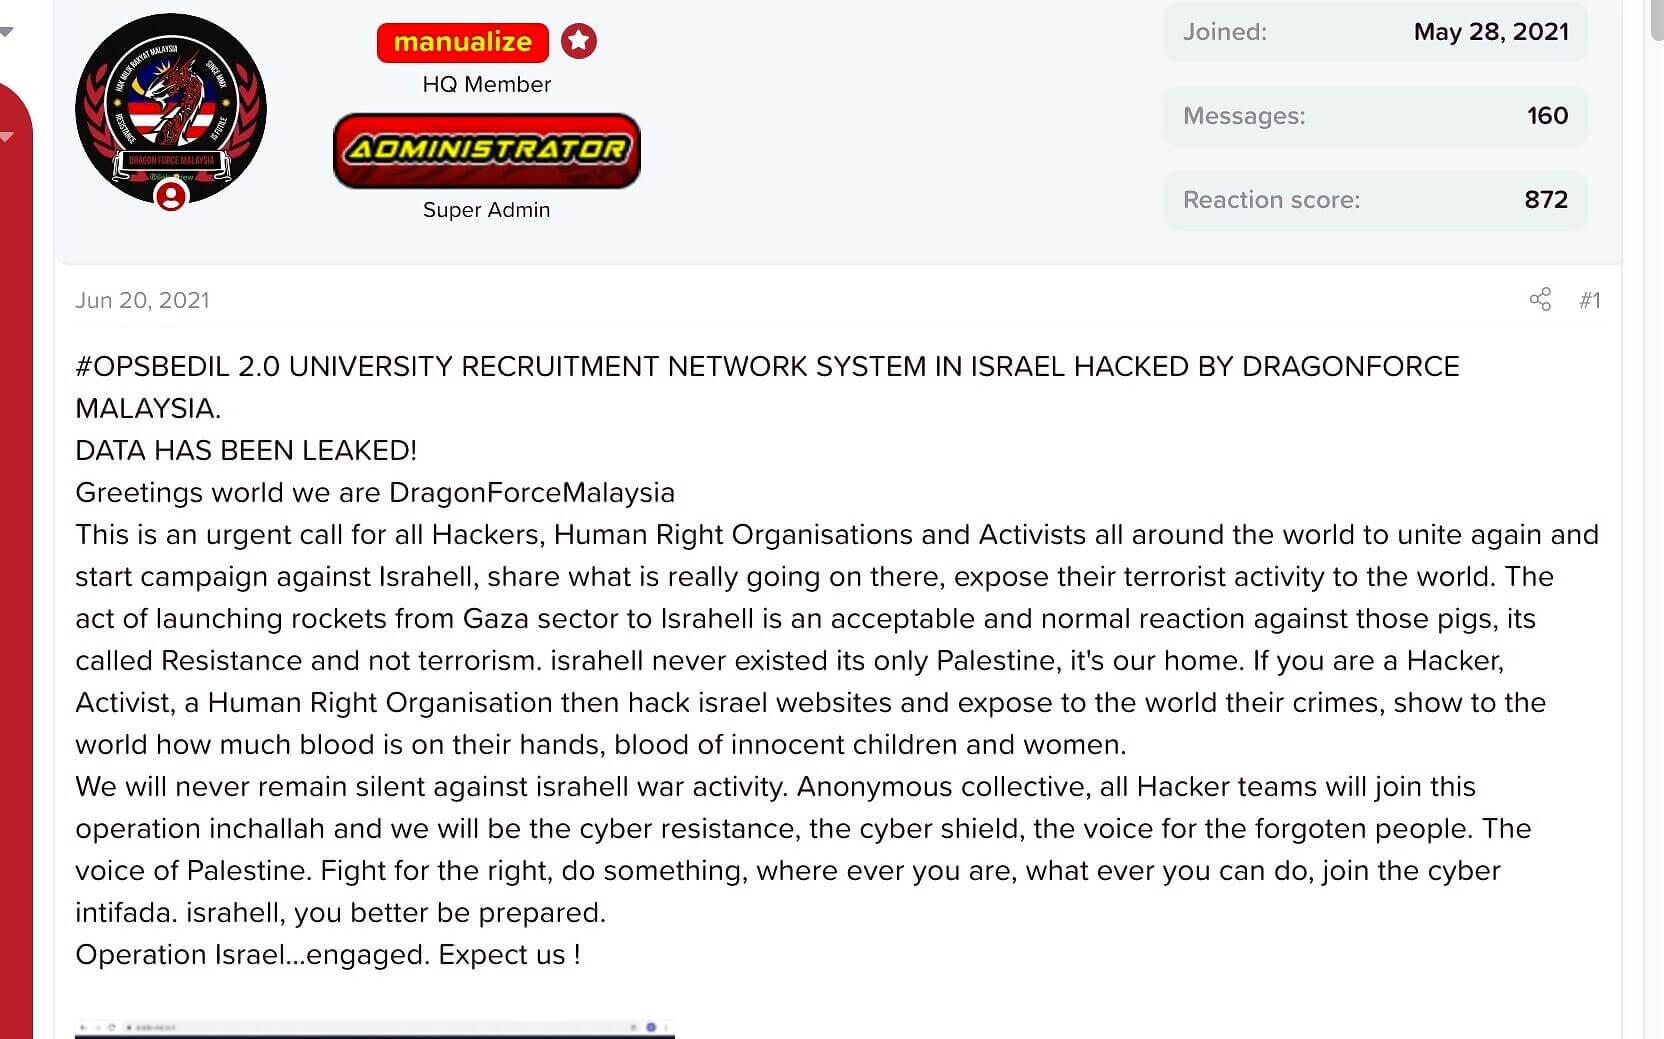 AcadeME data leakage Dragonforce announcement